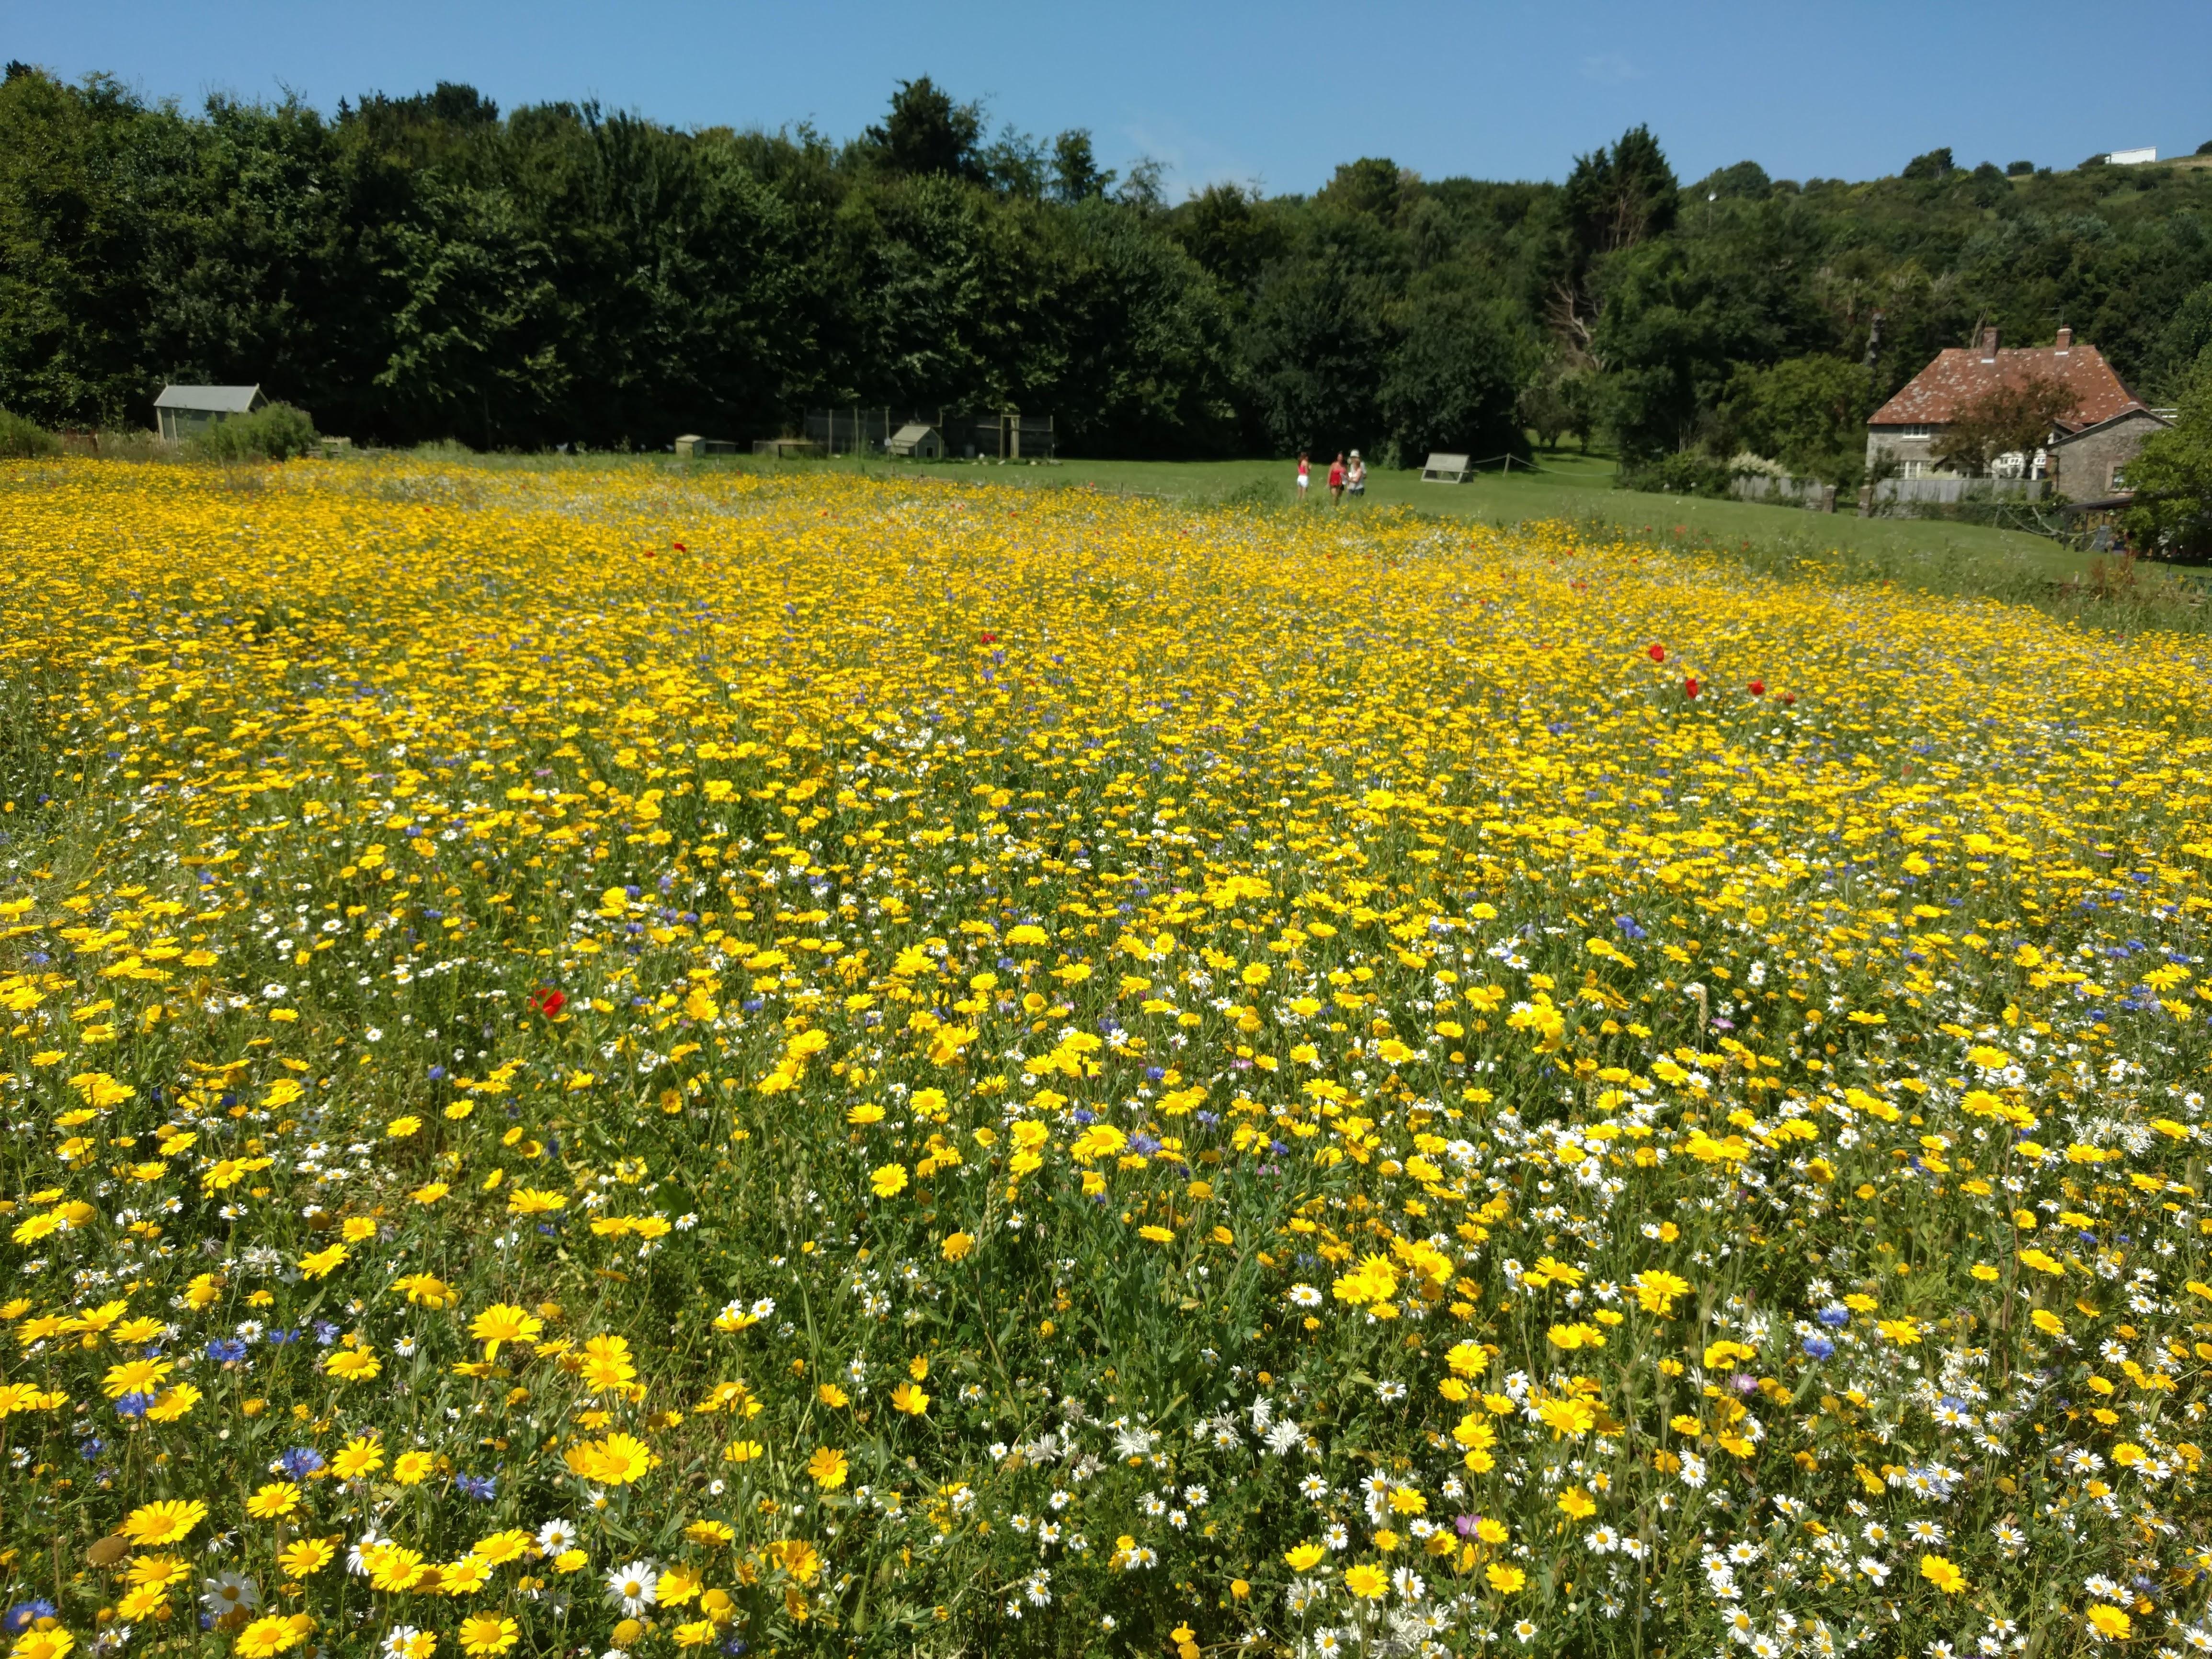 Wildflowers at The Garlic Farm